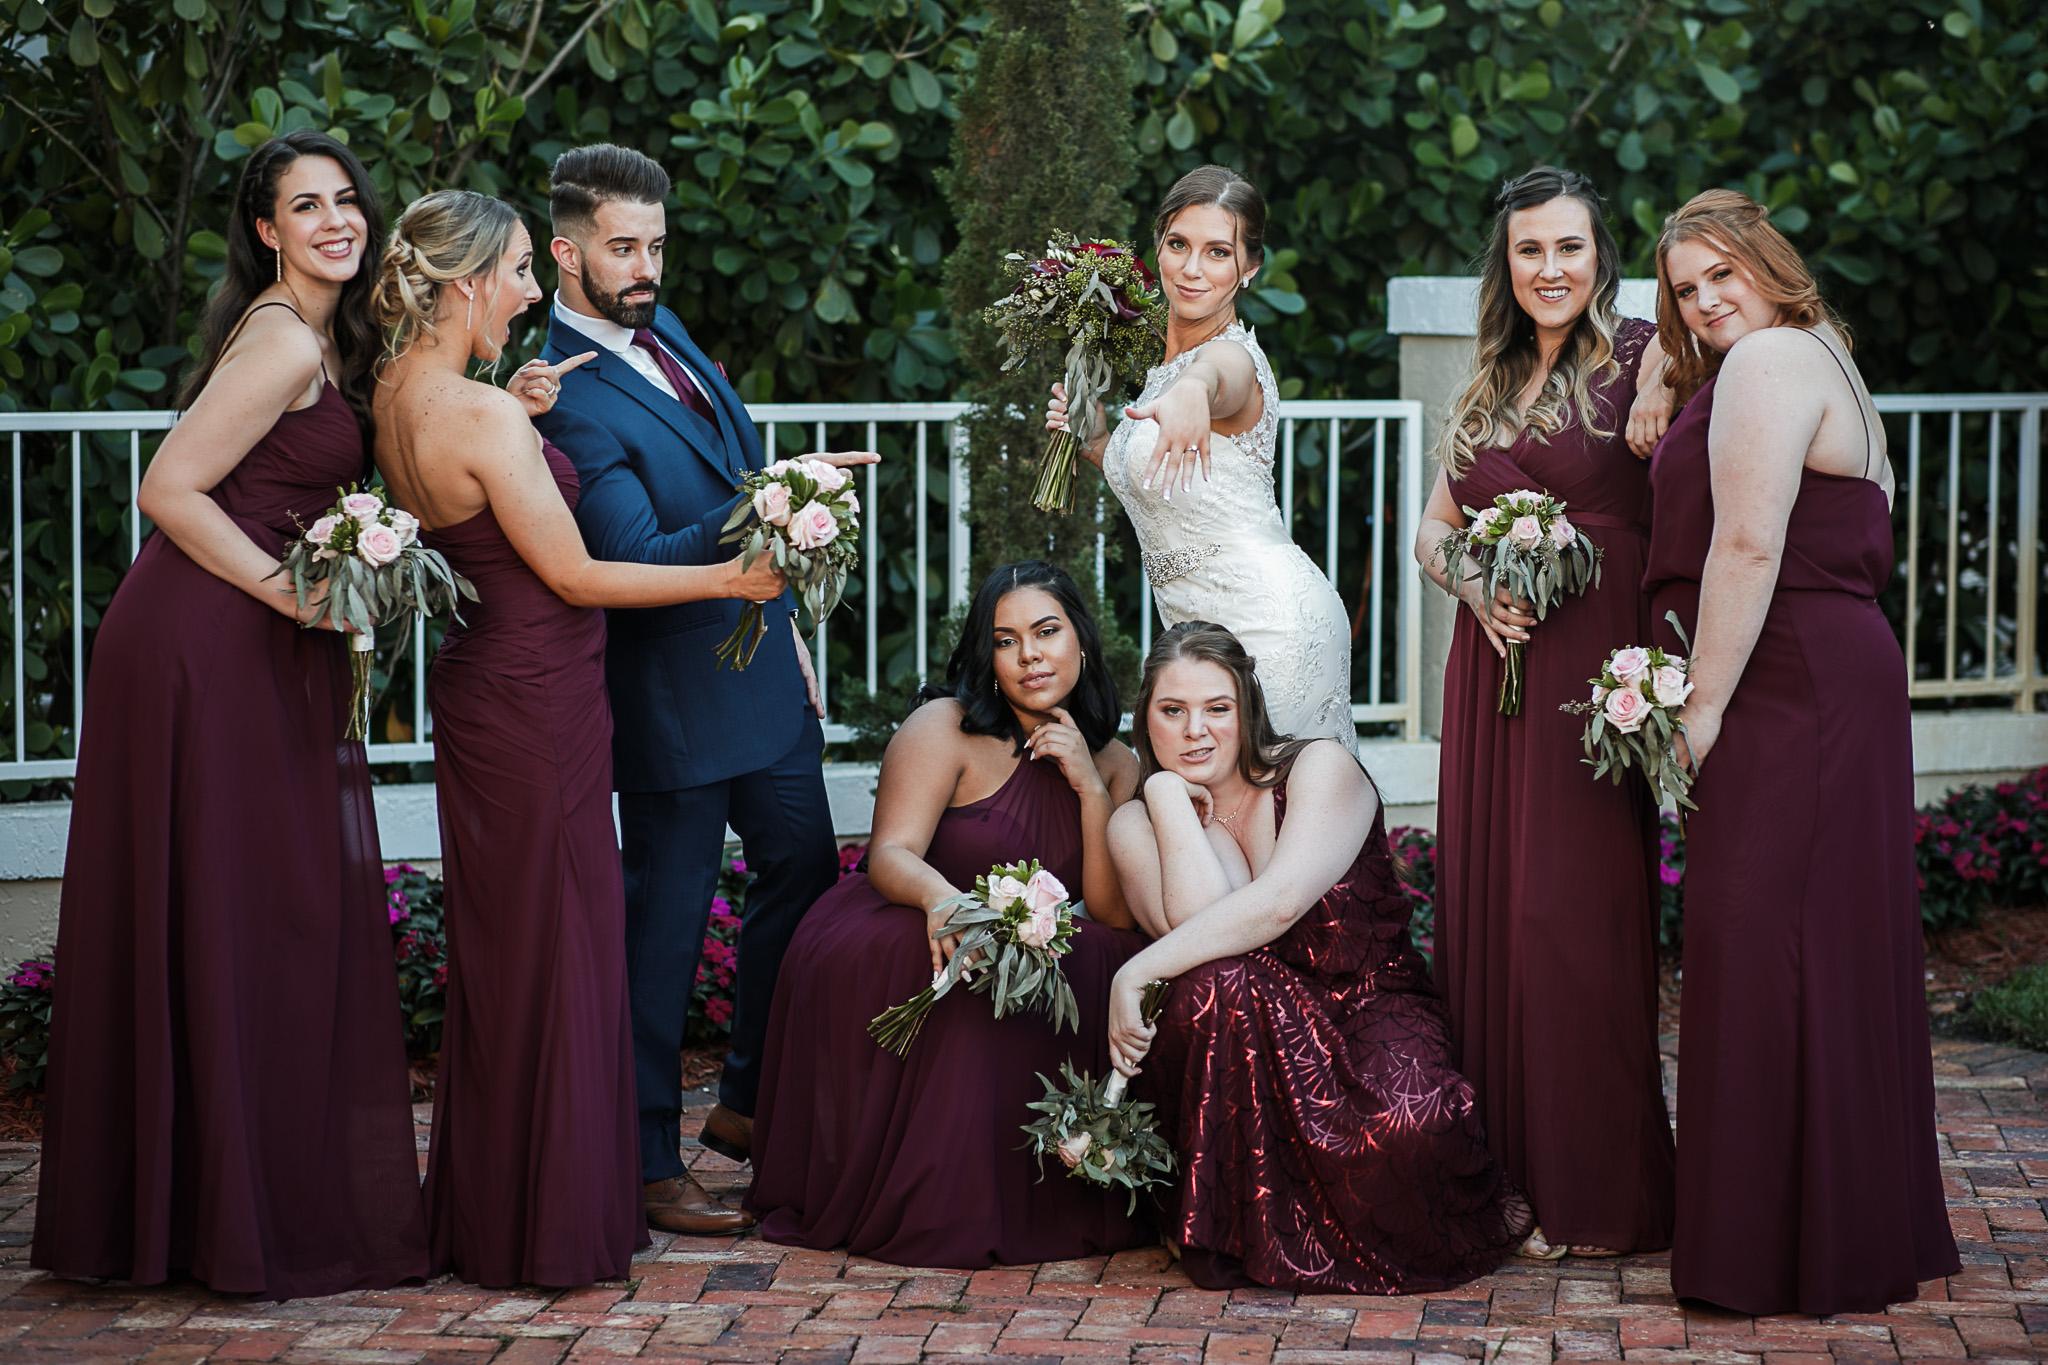 Miami-Wedding-Photographer-Coral-Gables-Venue-Bridesmaids-group-shot